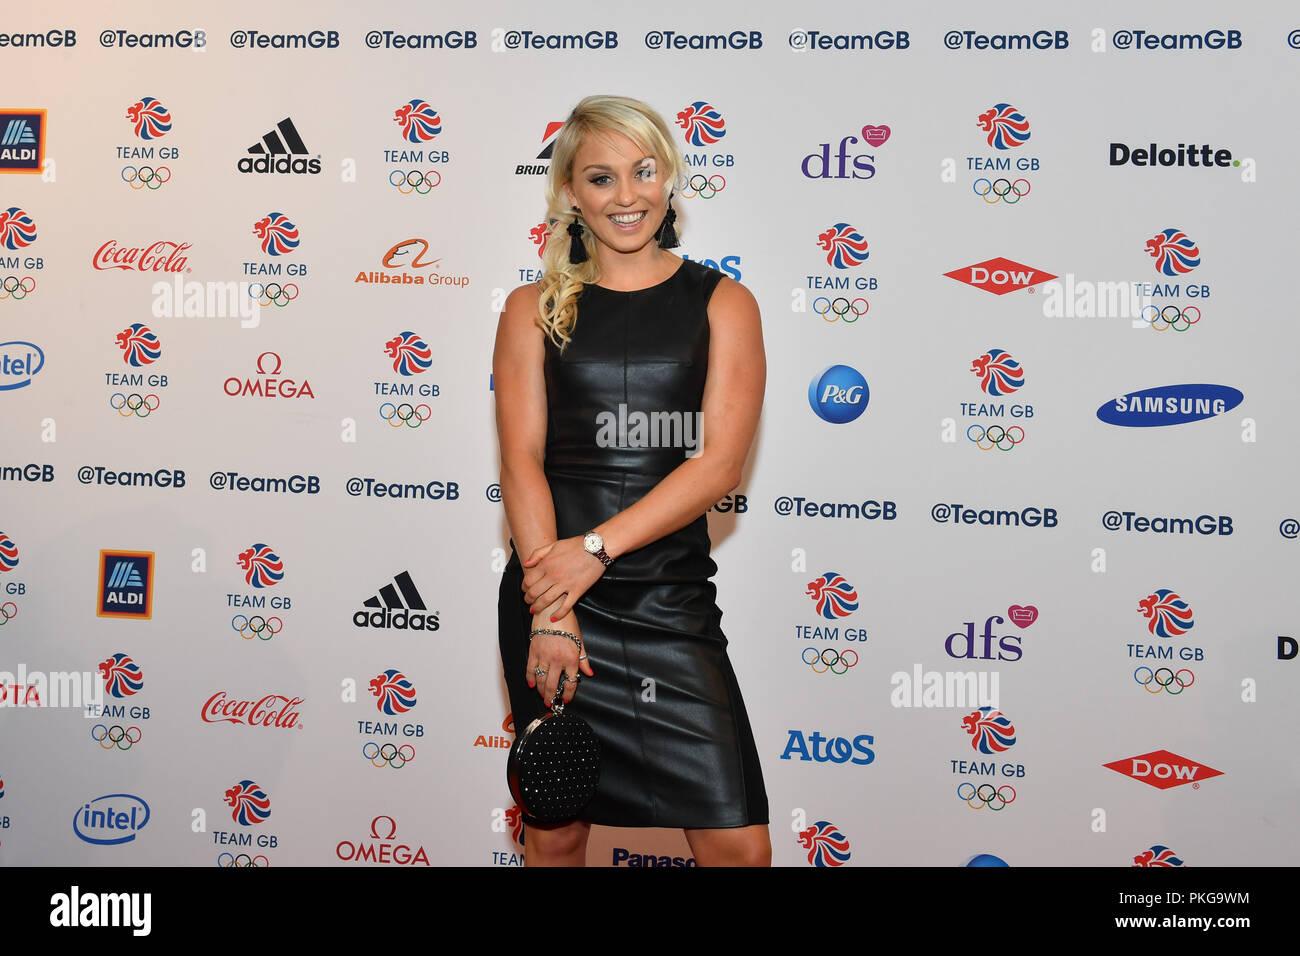 London, UK. 13th September 2018. Aimee Fuller arrives at the Team GB Ball 2018 - Red Carpet Arrivals on Thursday, September 13, 2018, LONDON ENGLAND. Credit: Taka Wu/Alamy Live News - Stock Image